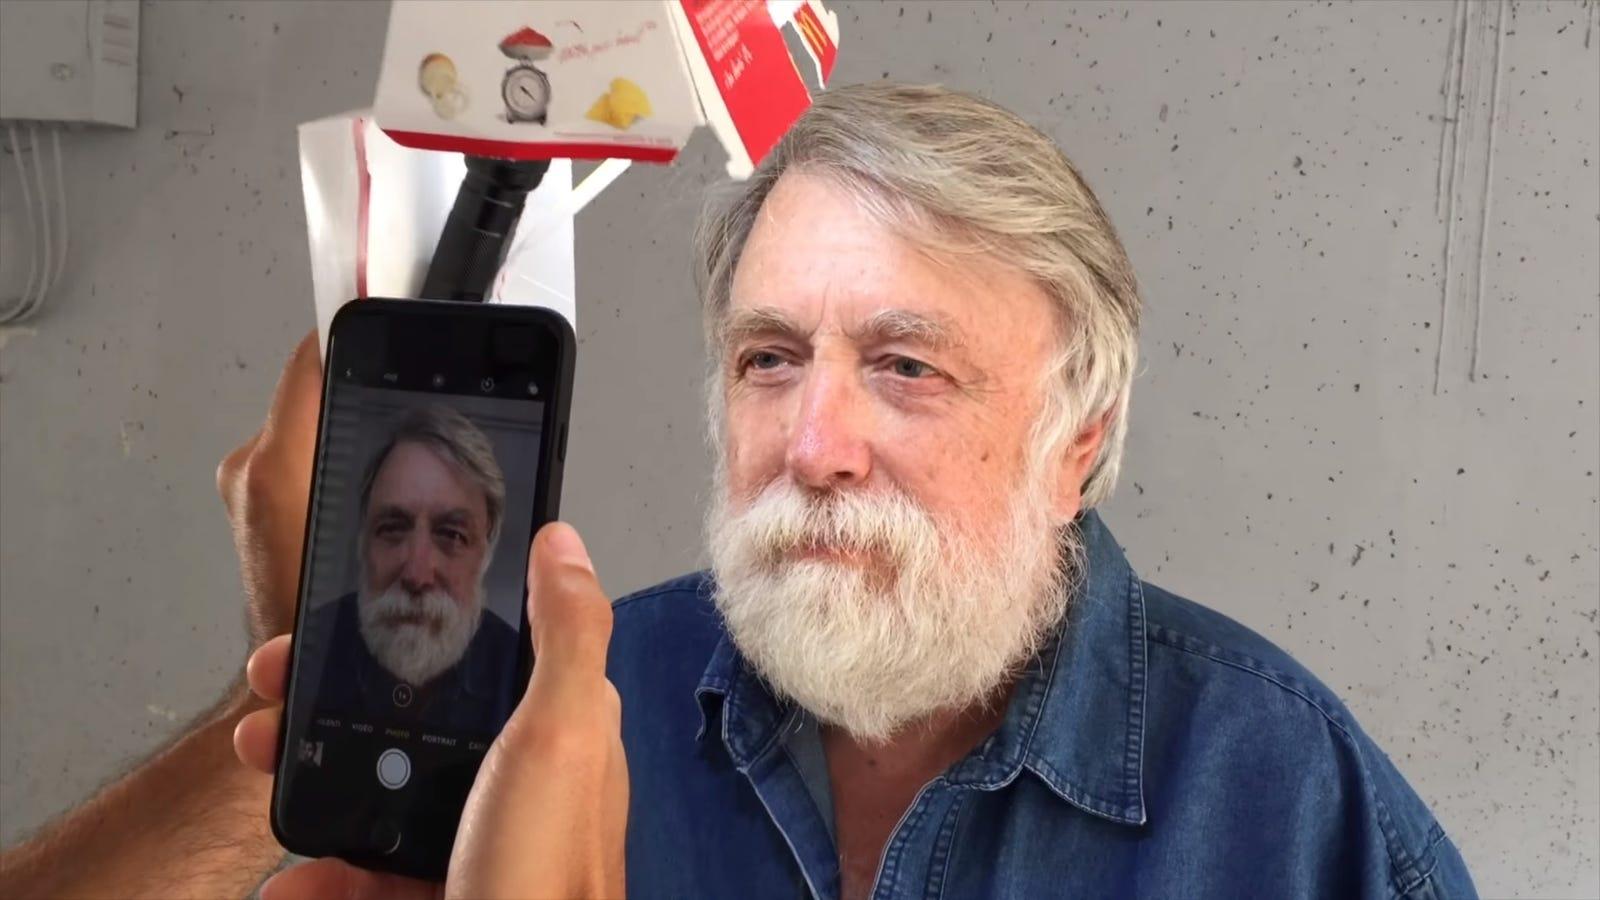 Light Smartphone Portrait Photos With a Big Mac Box